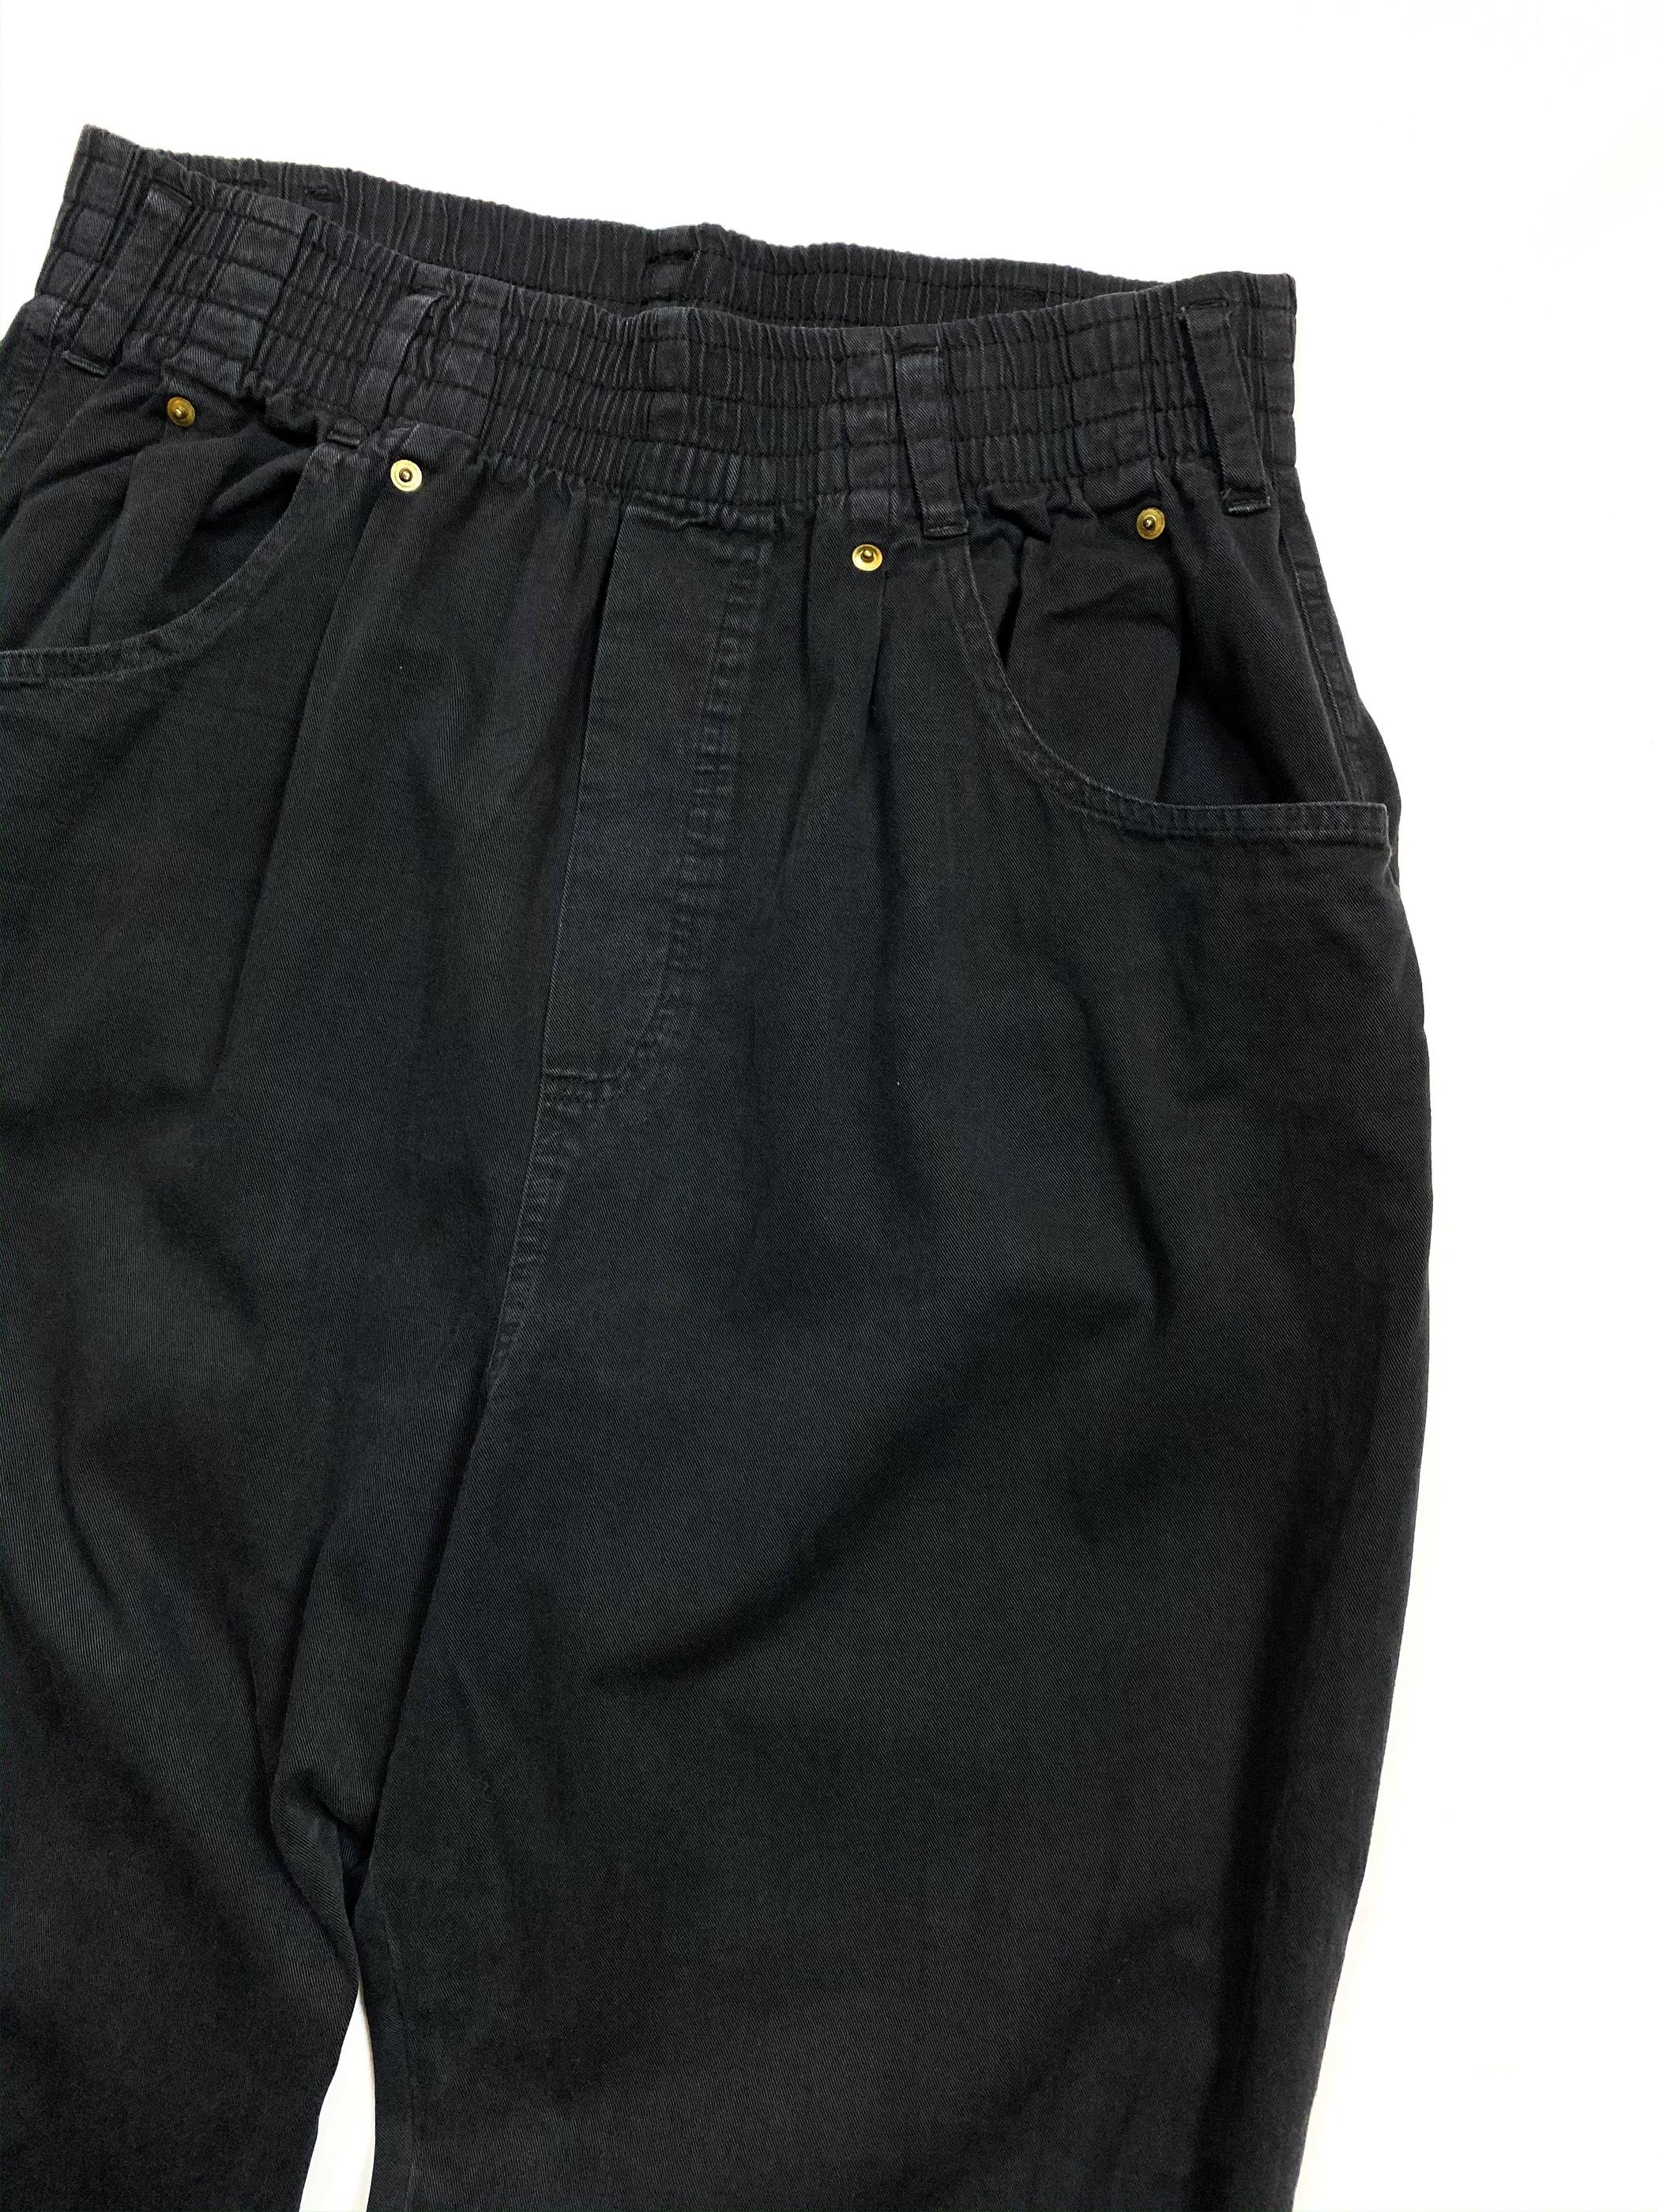 ~90's high waist easy pants